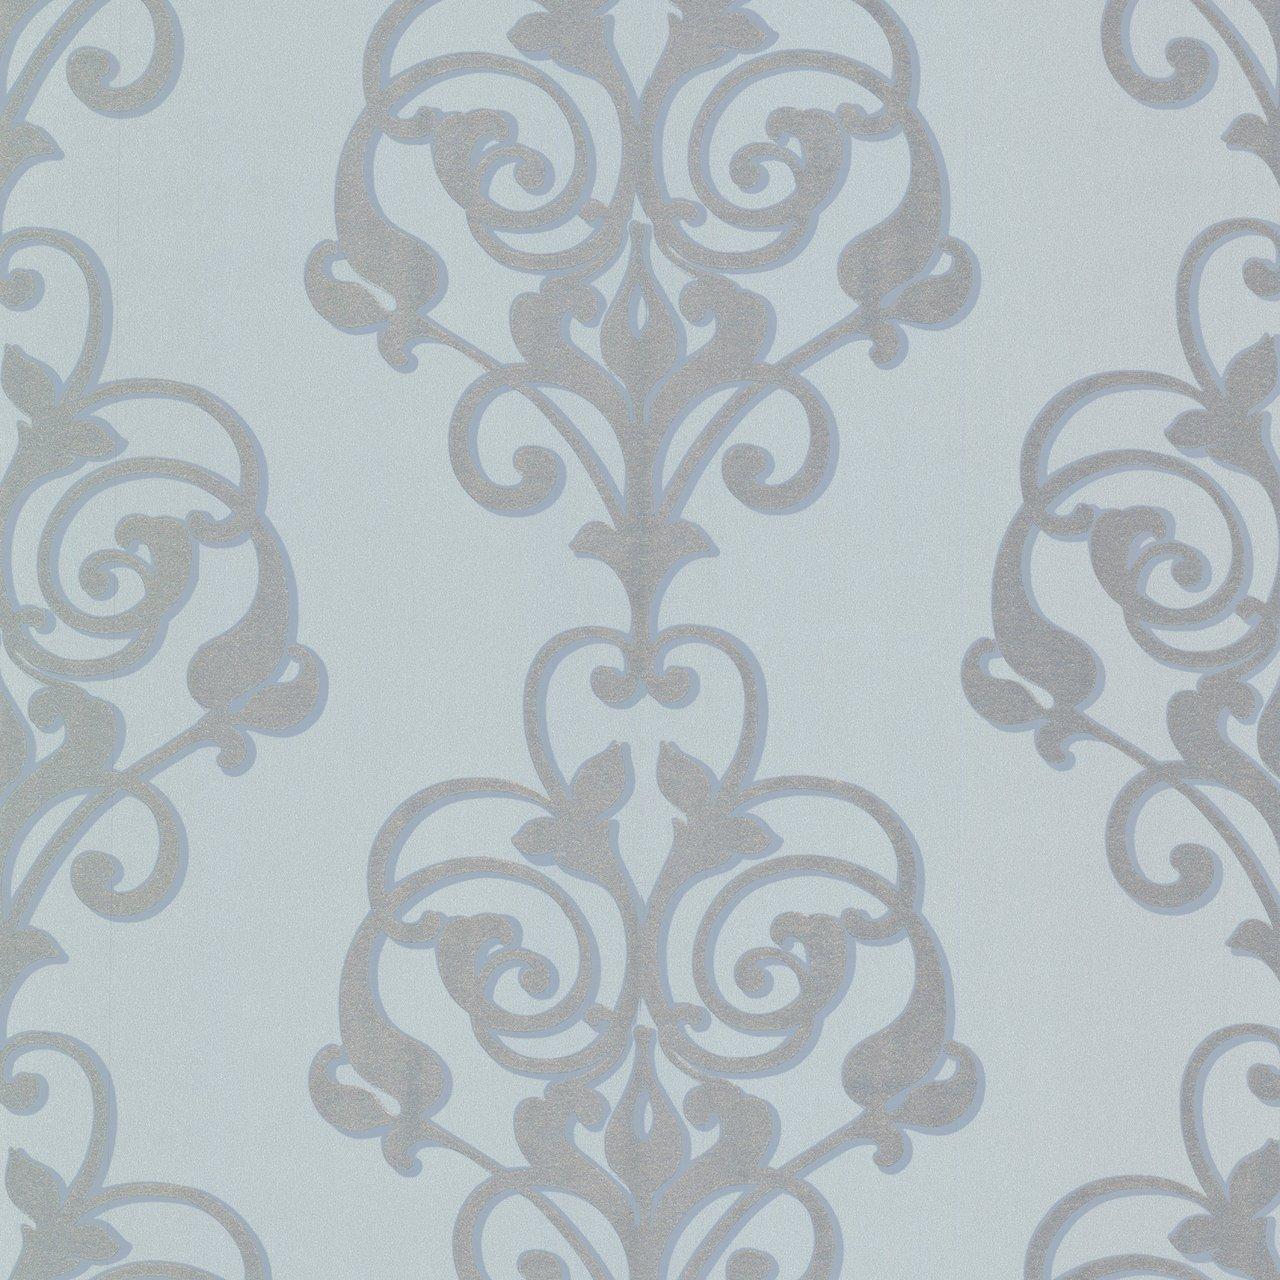 Beacon House 493 Atb007 Aeneas Modern Damask Wallpaper Beige Amazon Com